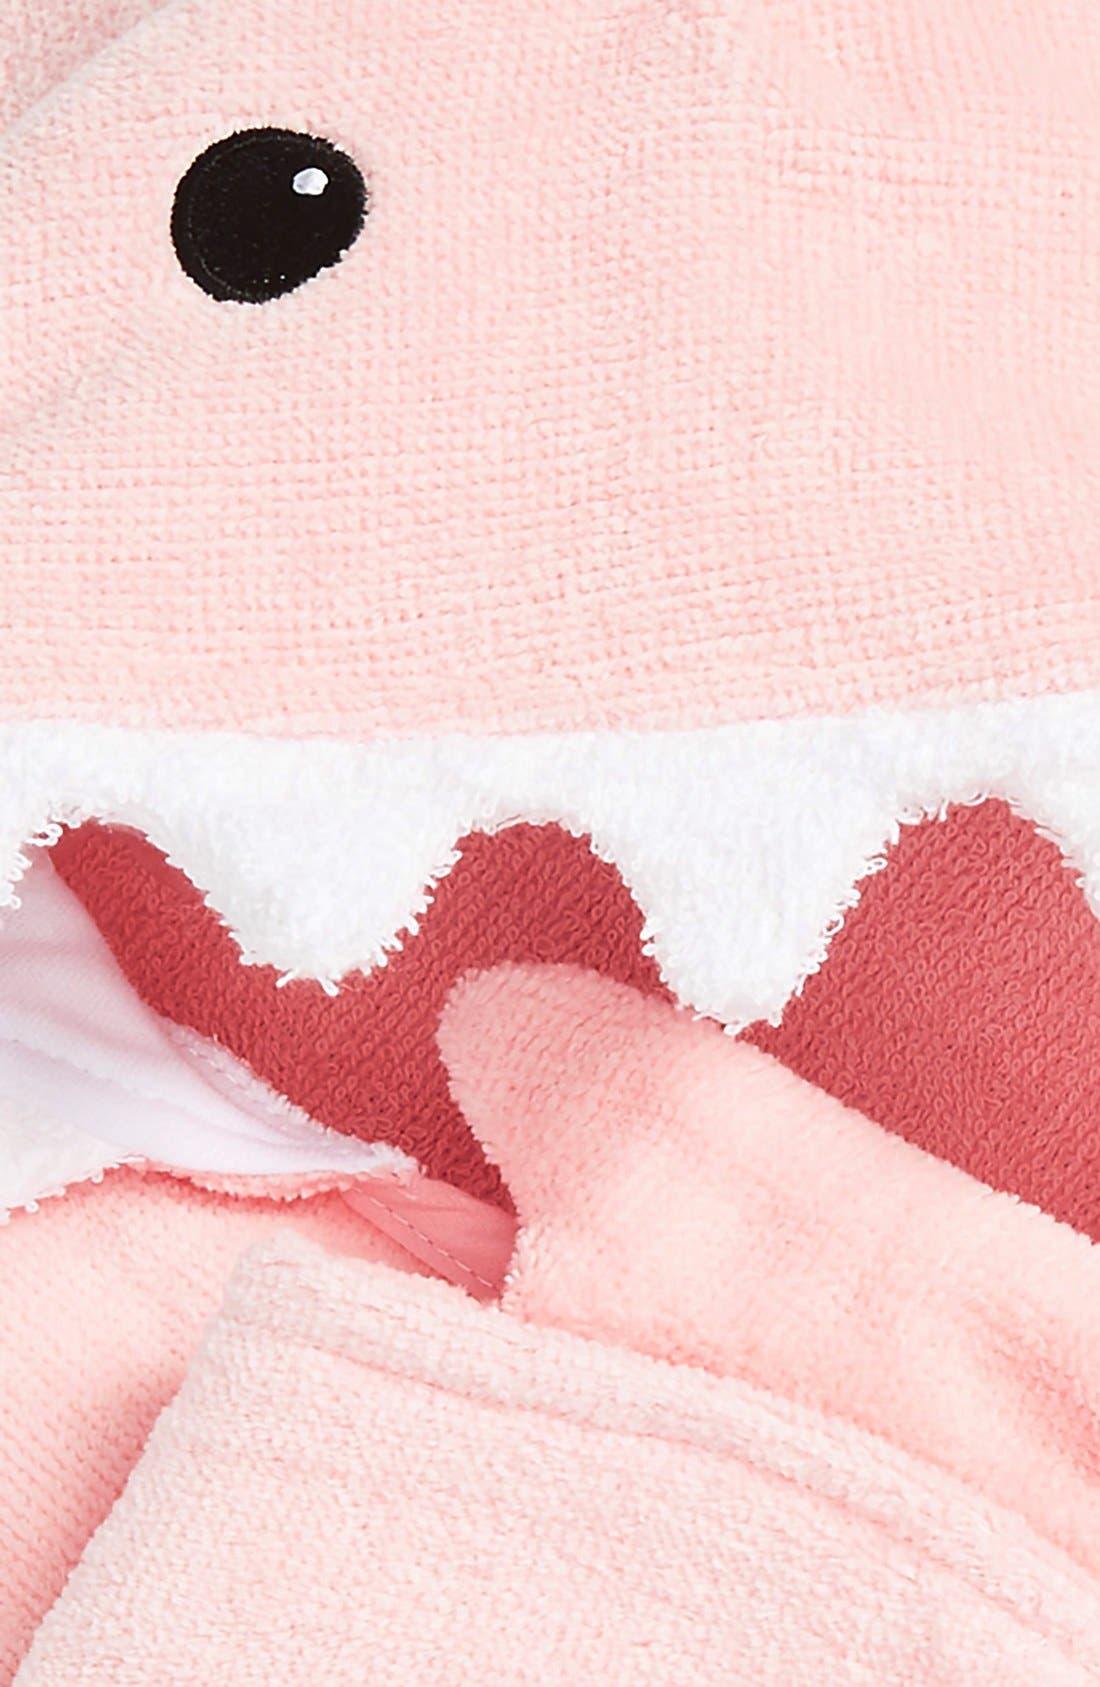 'Let the Fin Begin' Hooded Terry Robe, Bath Mitt & Slippers Set,                             Alternate thumbnail 3, color,                             Light Pink